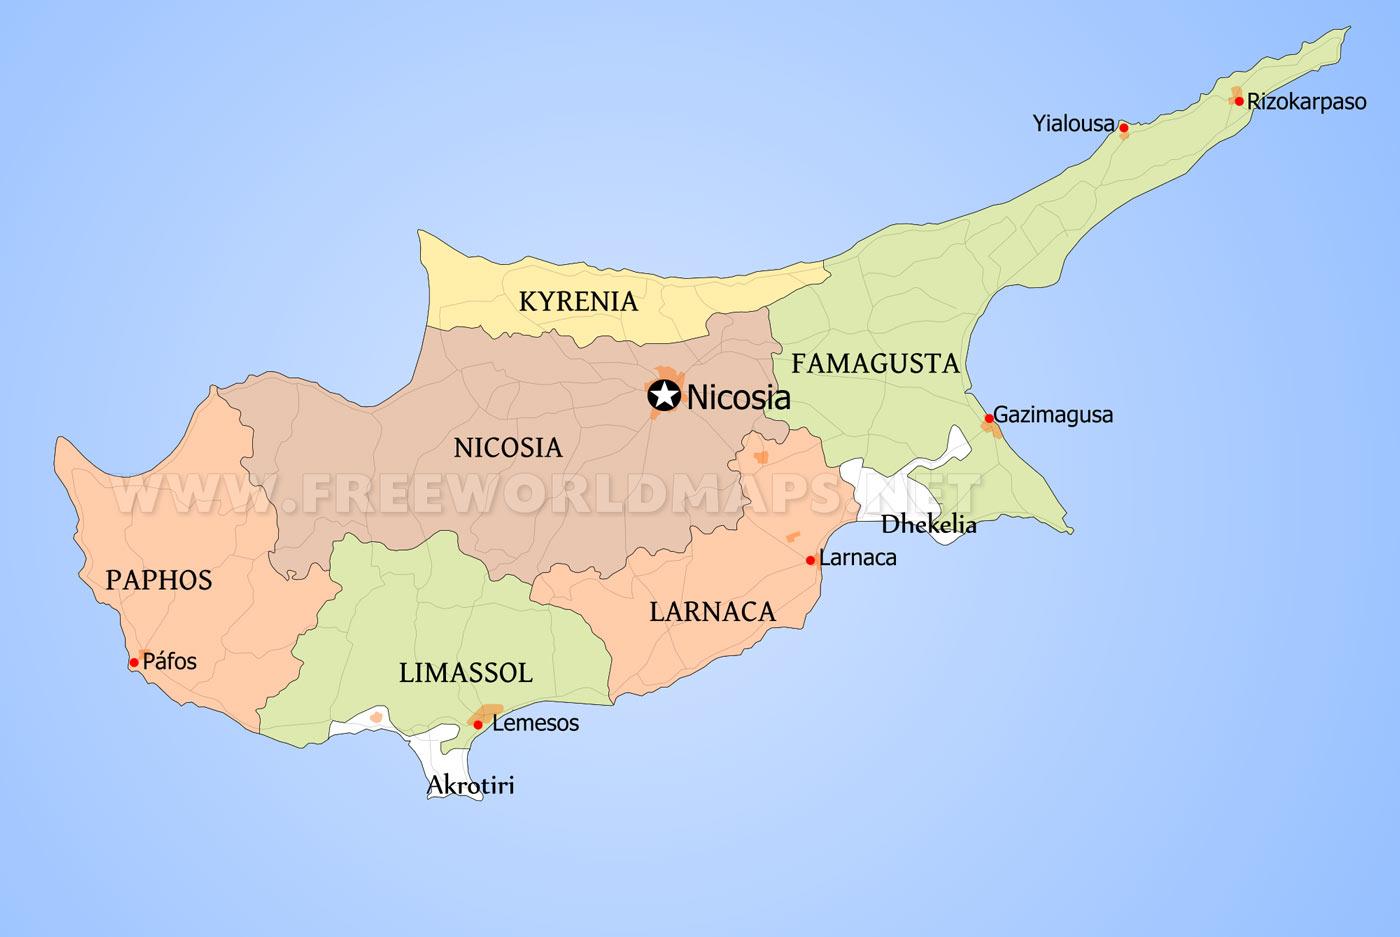 Cyprus Maps - by Freeworldmaps.net